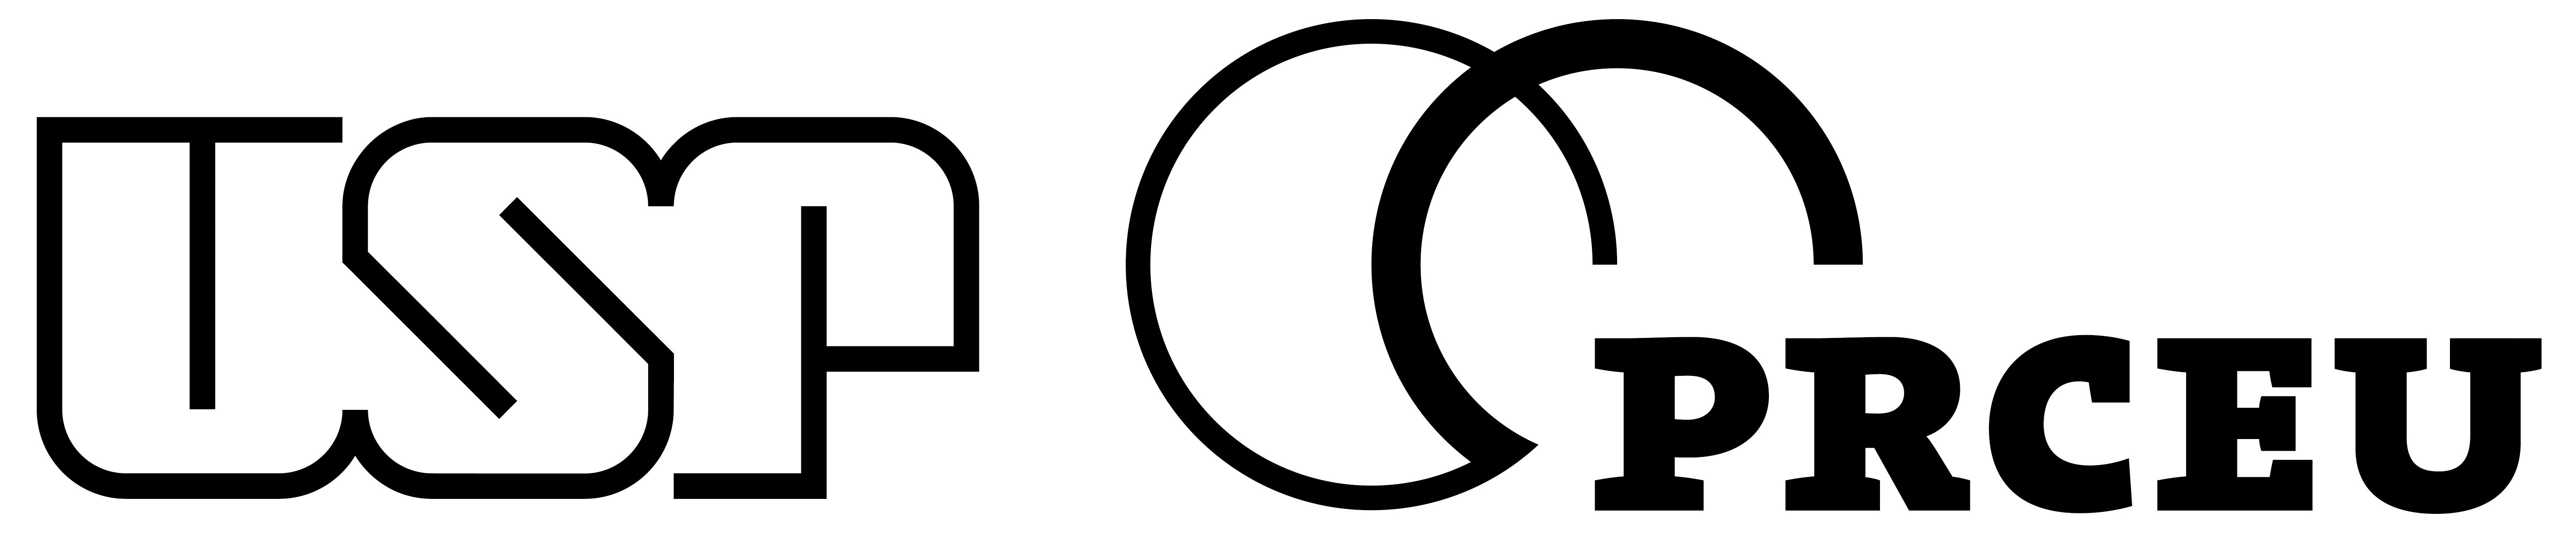 Logotipo da Notepad++